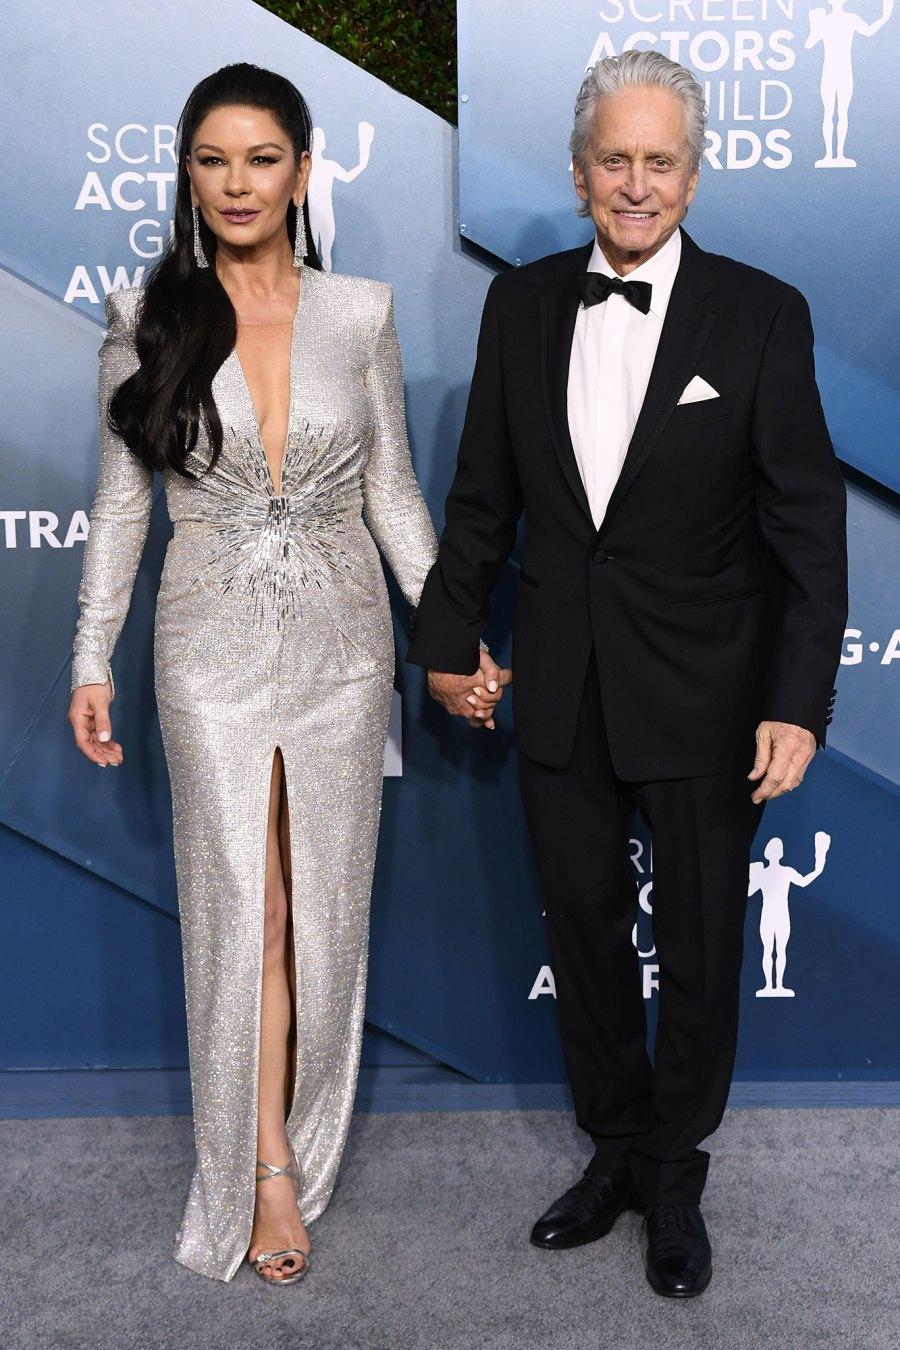 November 2019 Michael Douglas and Catherine Zeta-Jones Timeline of Their Longtime Romance